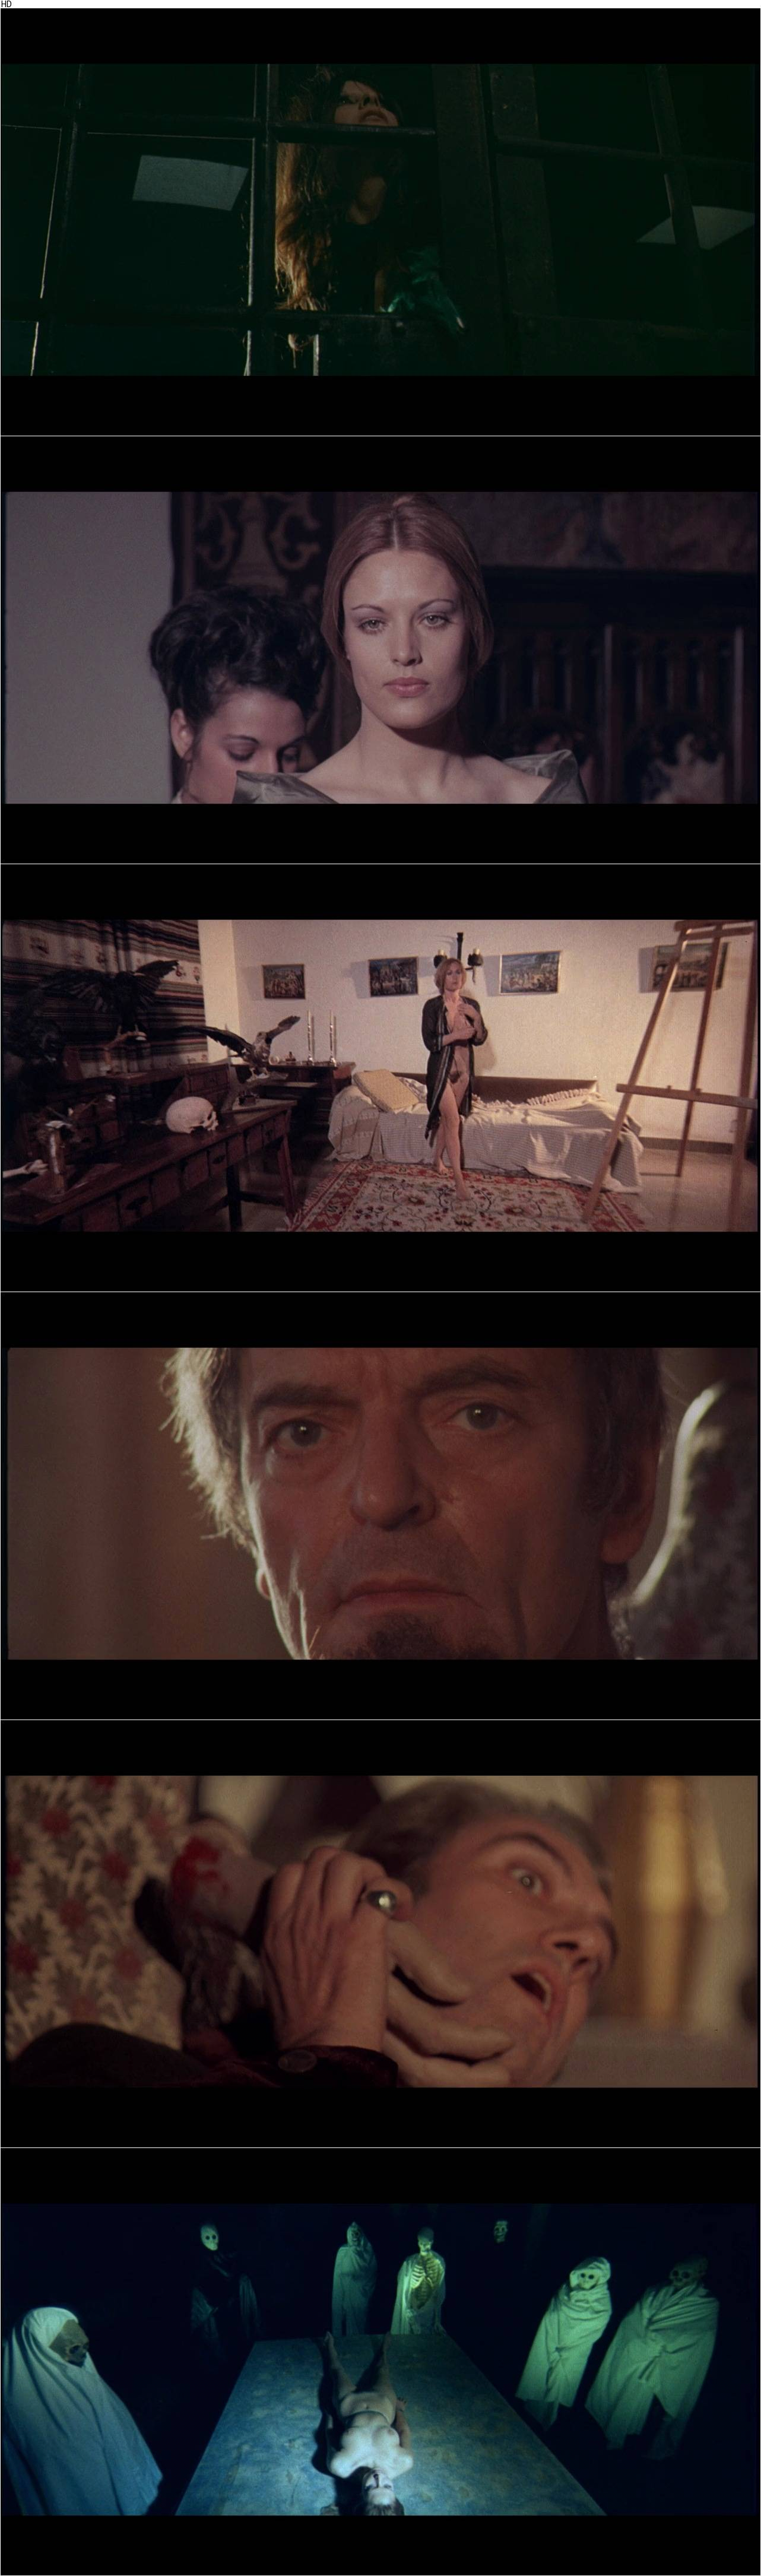 The Erotic Rites of Frankenstein (1973) La maldición de Frankenstein